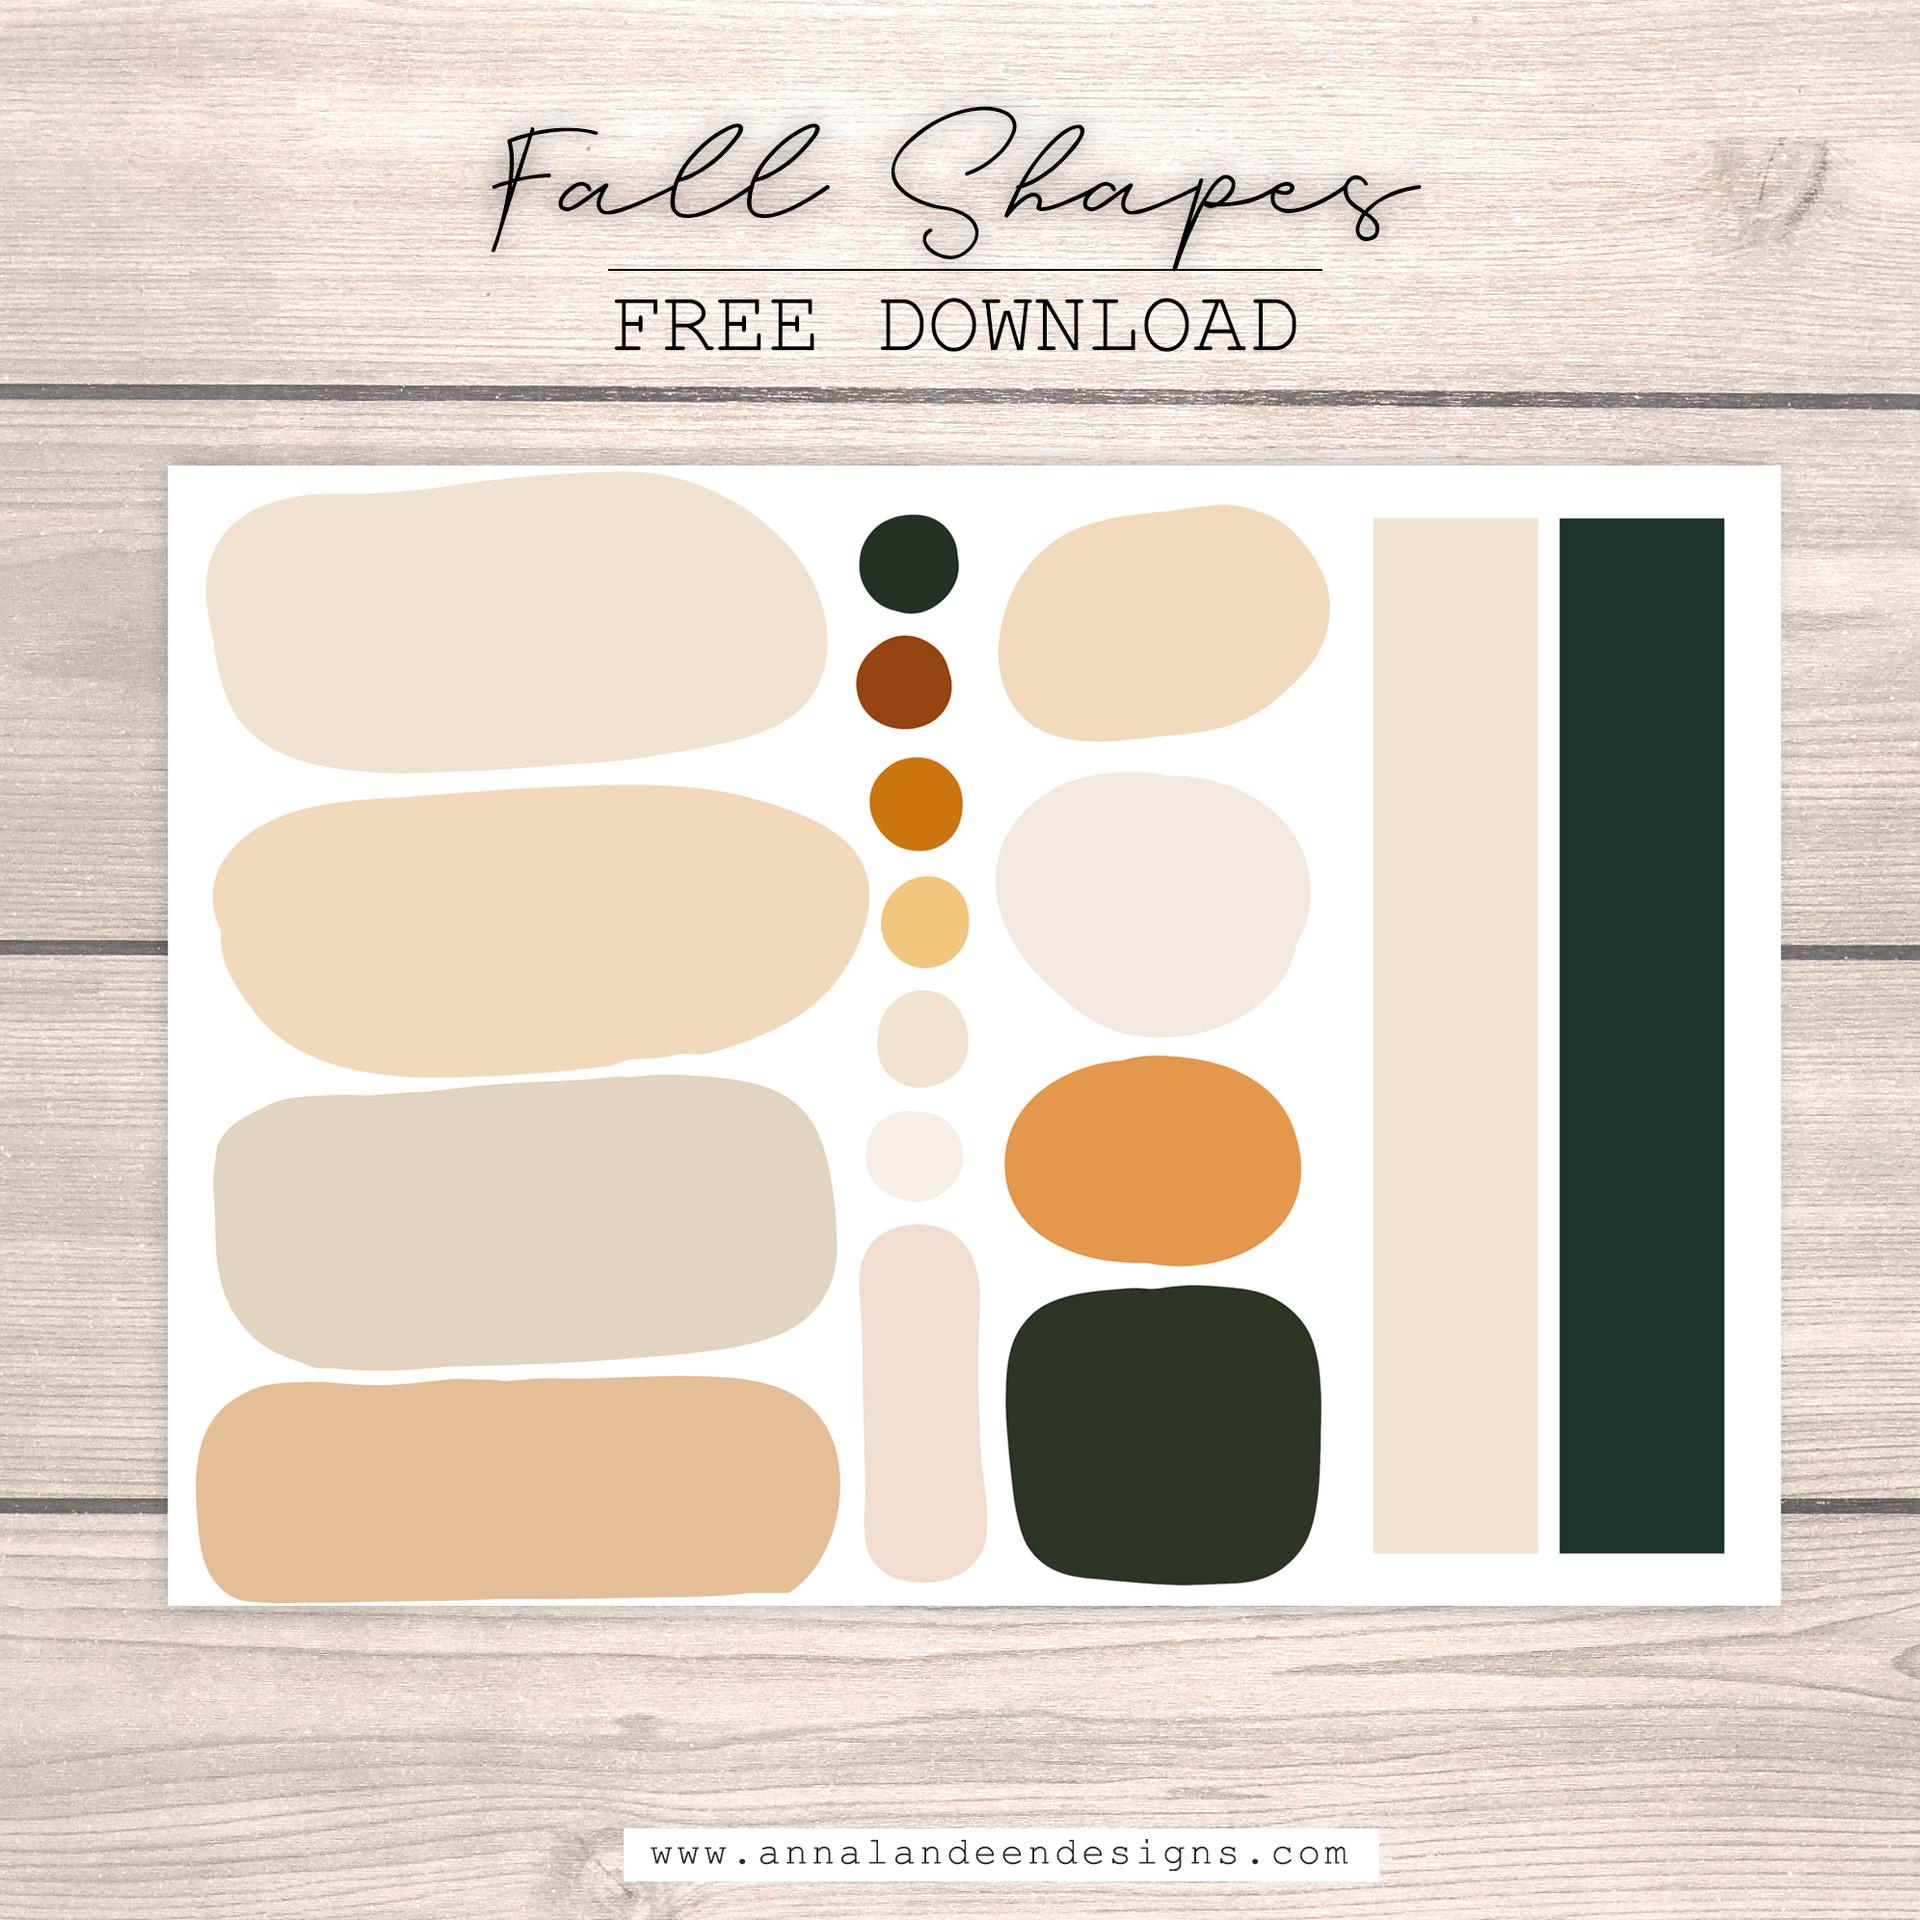 Fall Shapes 1